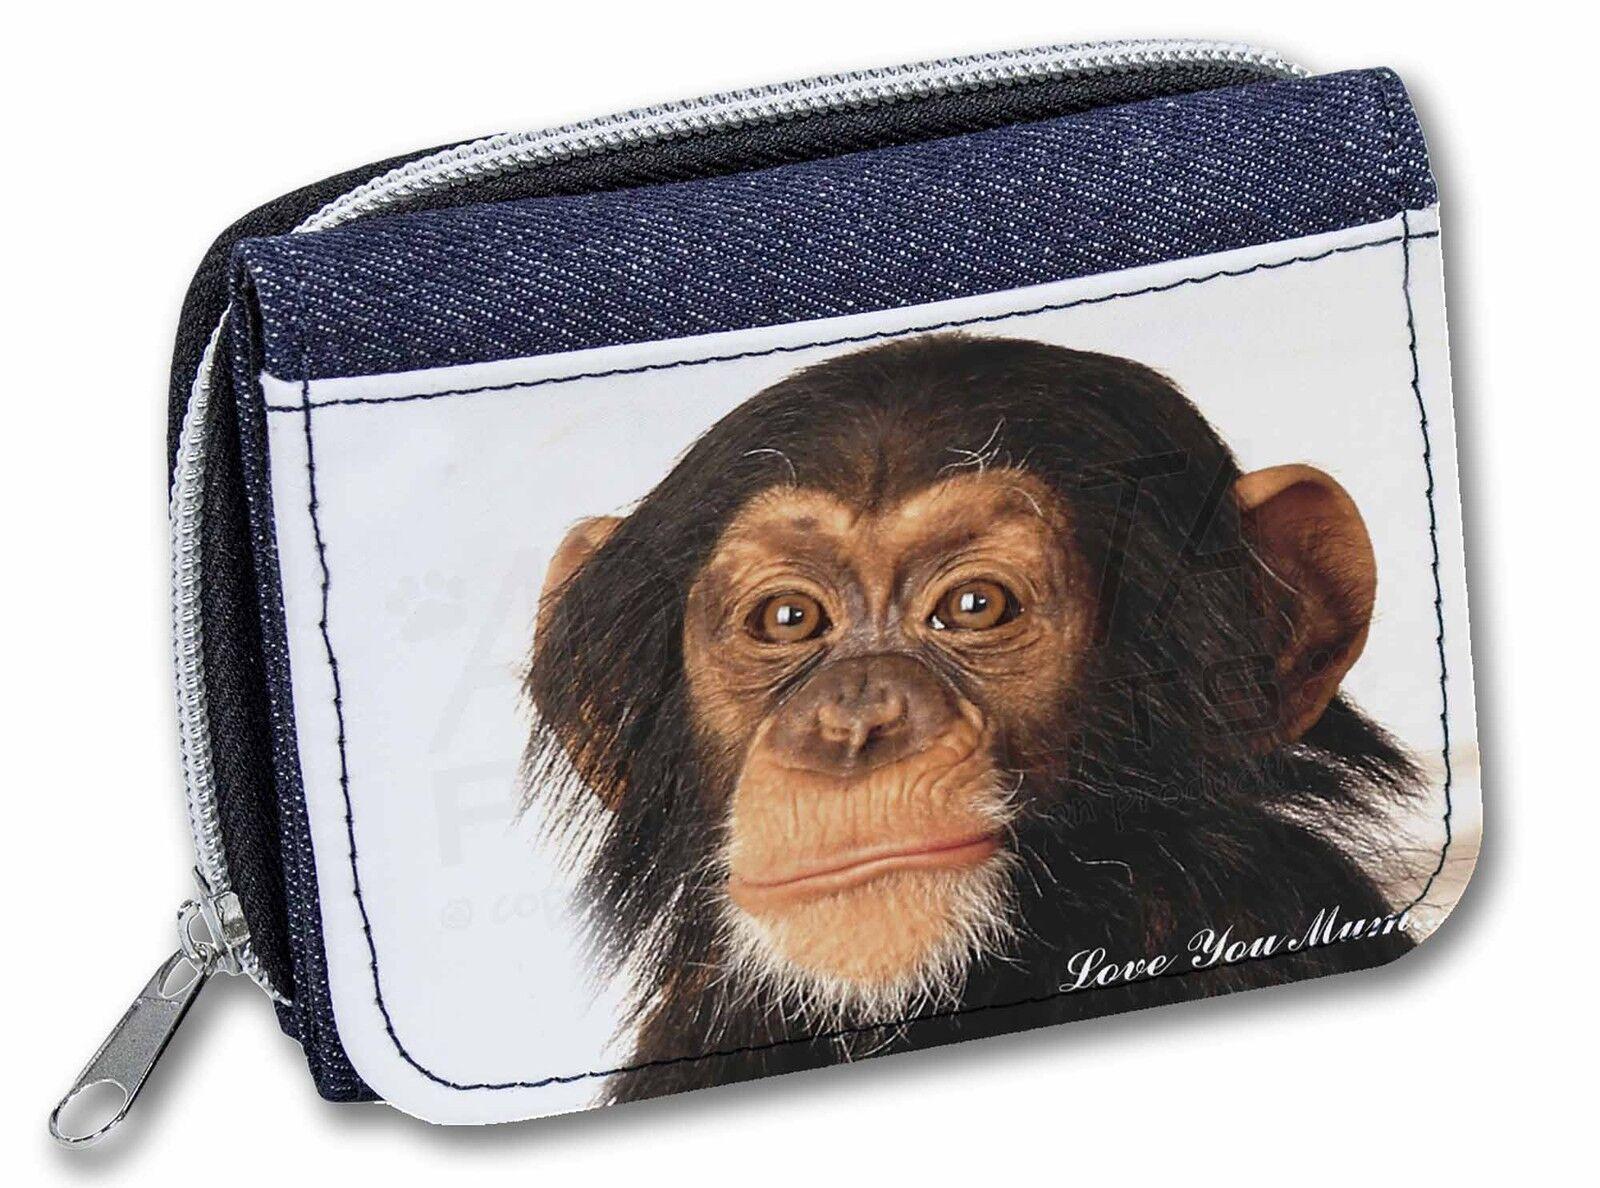 Chimpanzee 'Love You Mum' Girls/Ladies Denim Purse Wallet Christmas G, AM-1lymJW